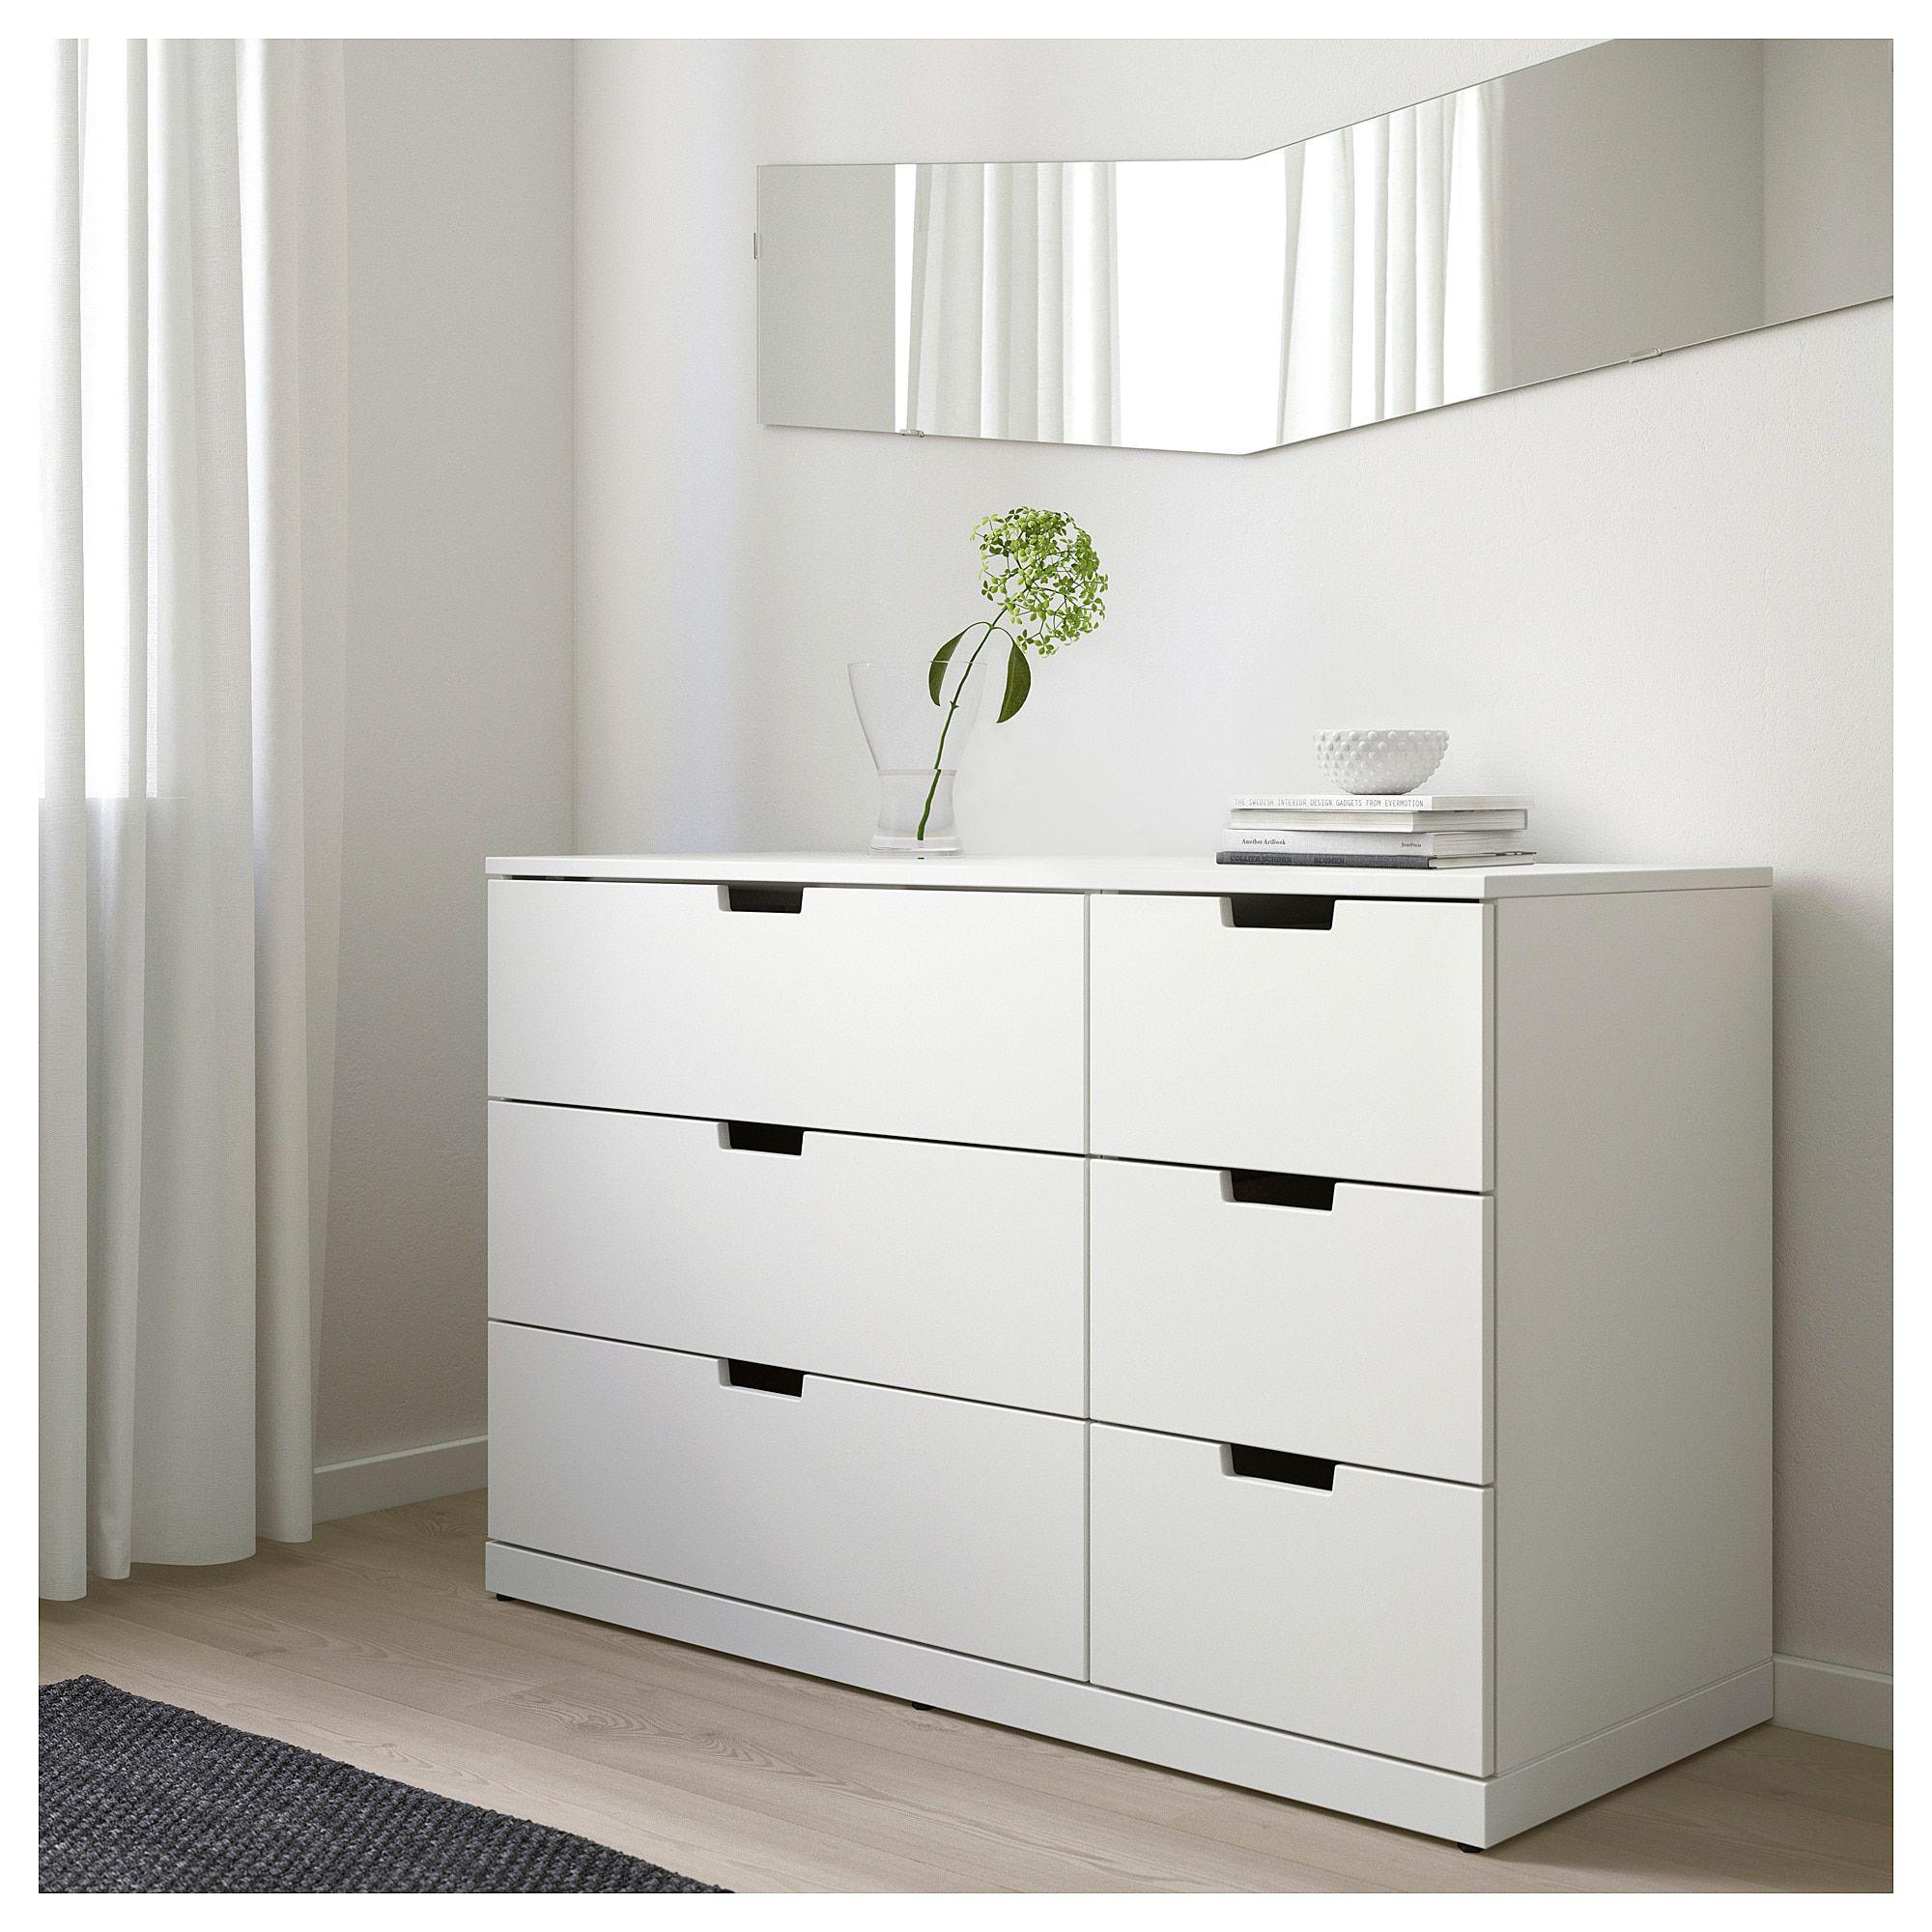 Ikea Malm Kommode 6 Skuffer 2021